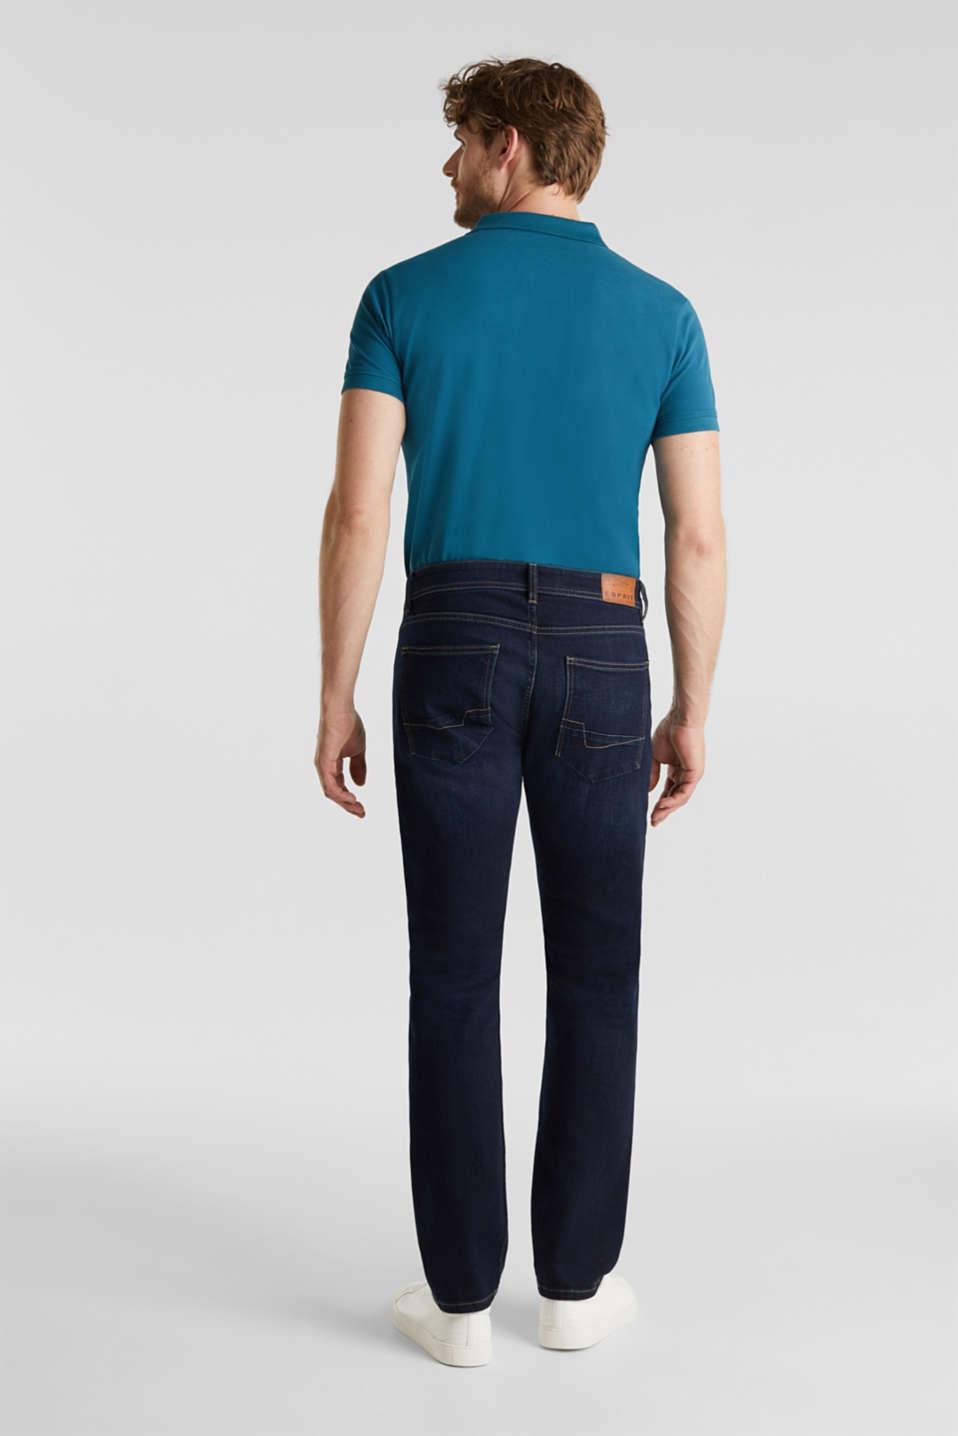 Pants denim Straight fit, BLUE DARK WASH, detail image number 1